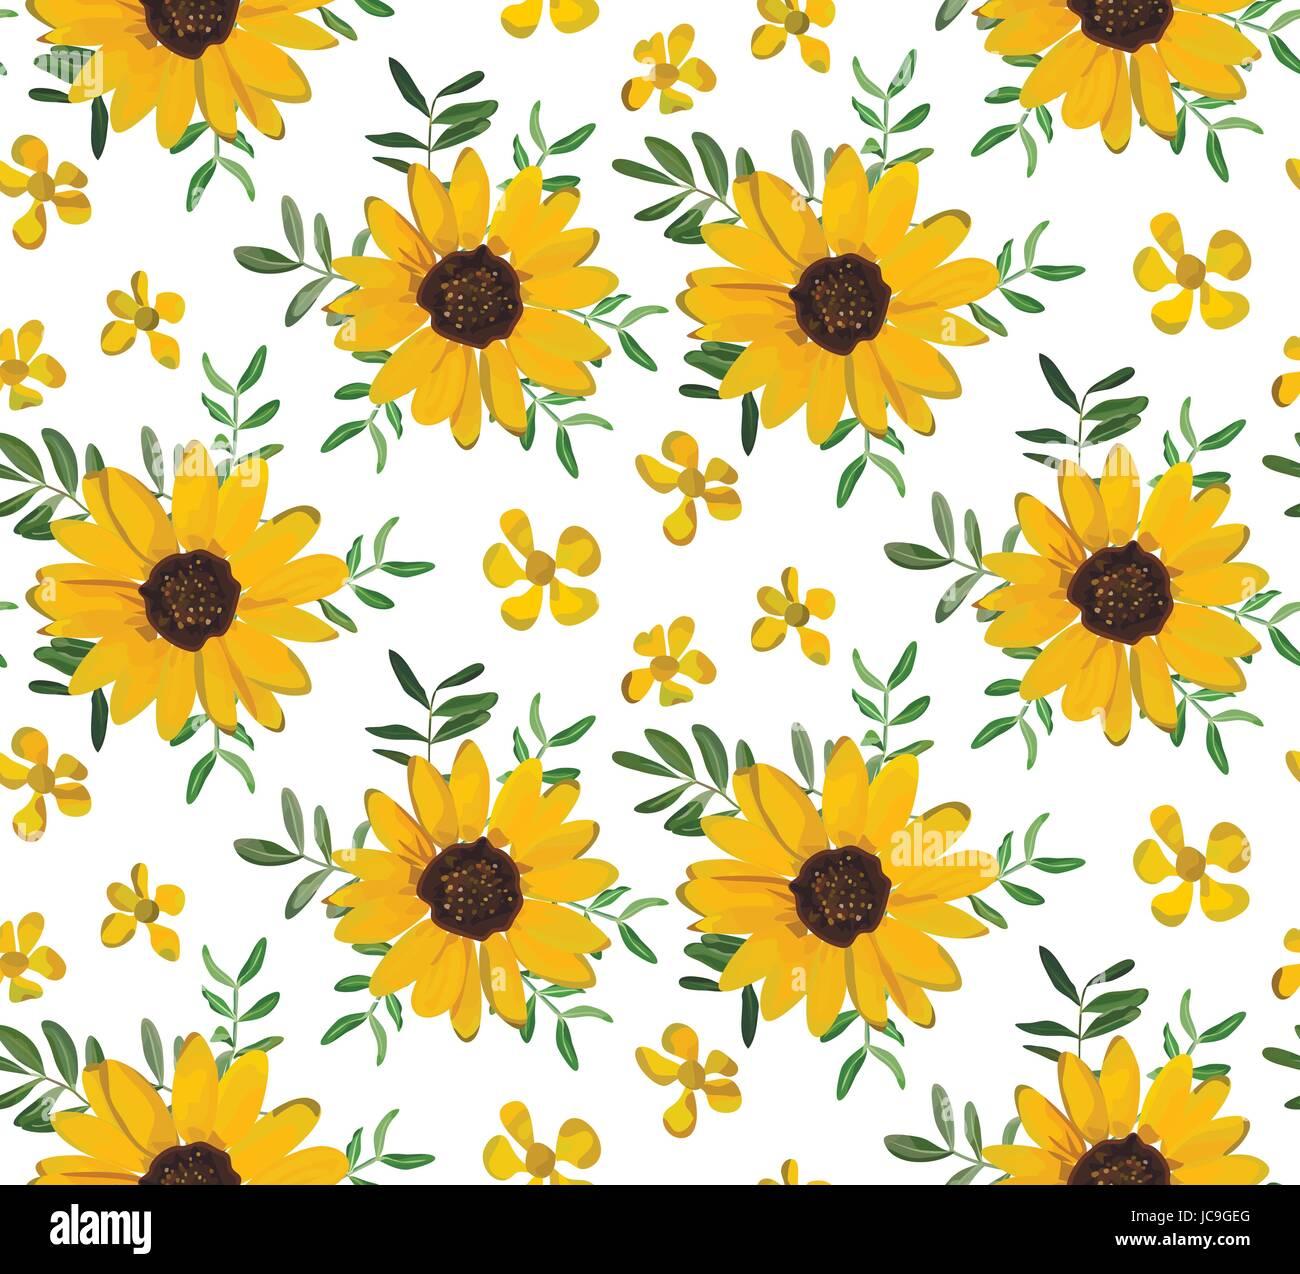 vintage yellow sunflower tiny beautiful soft flowers